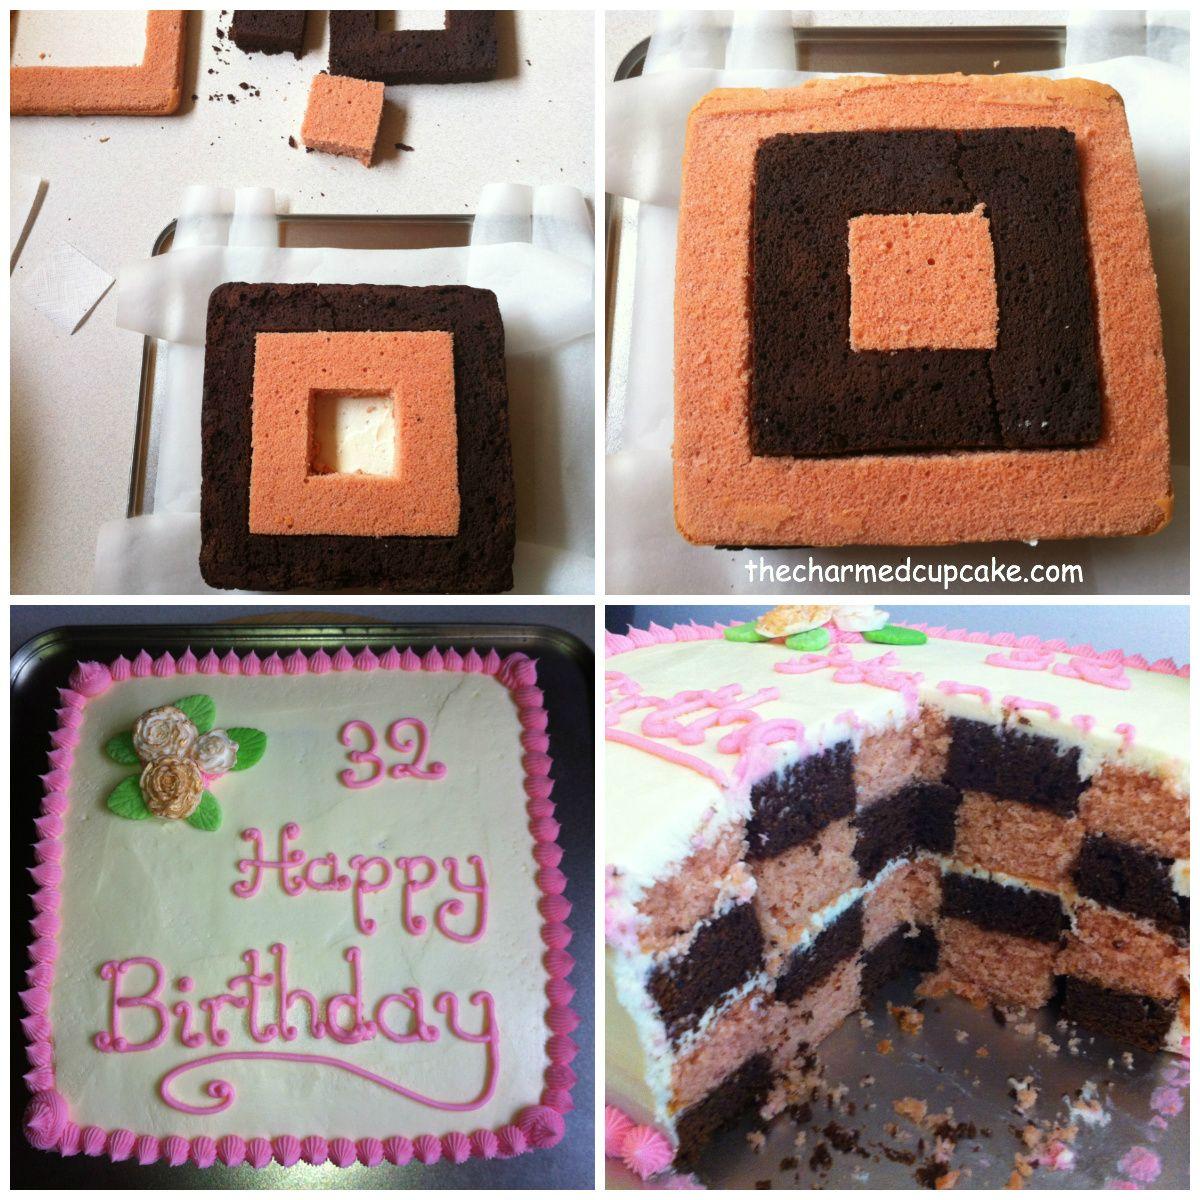 Practice Checkered Cake